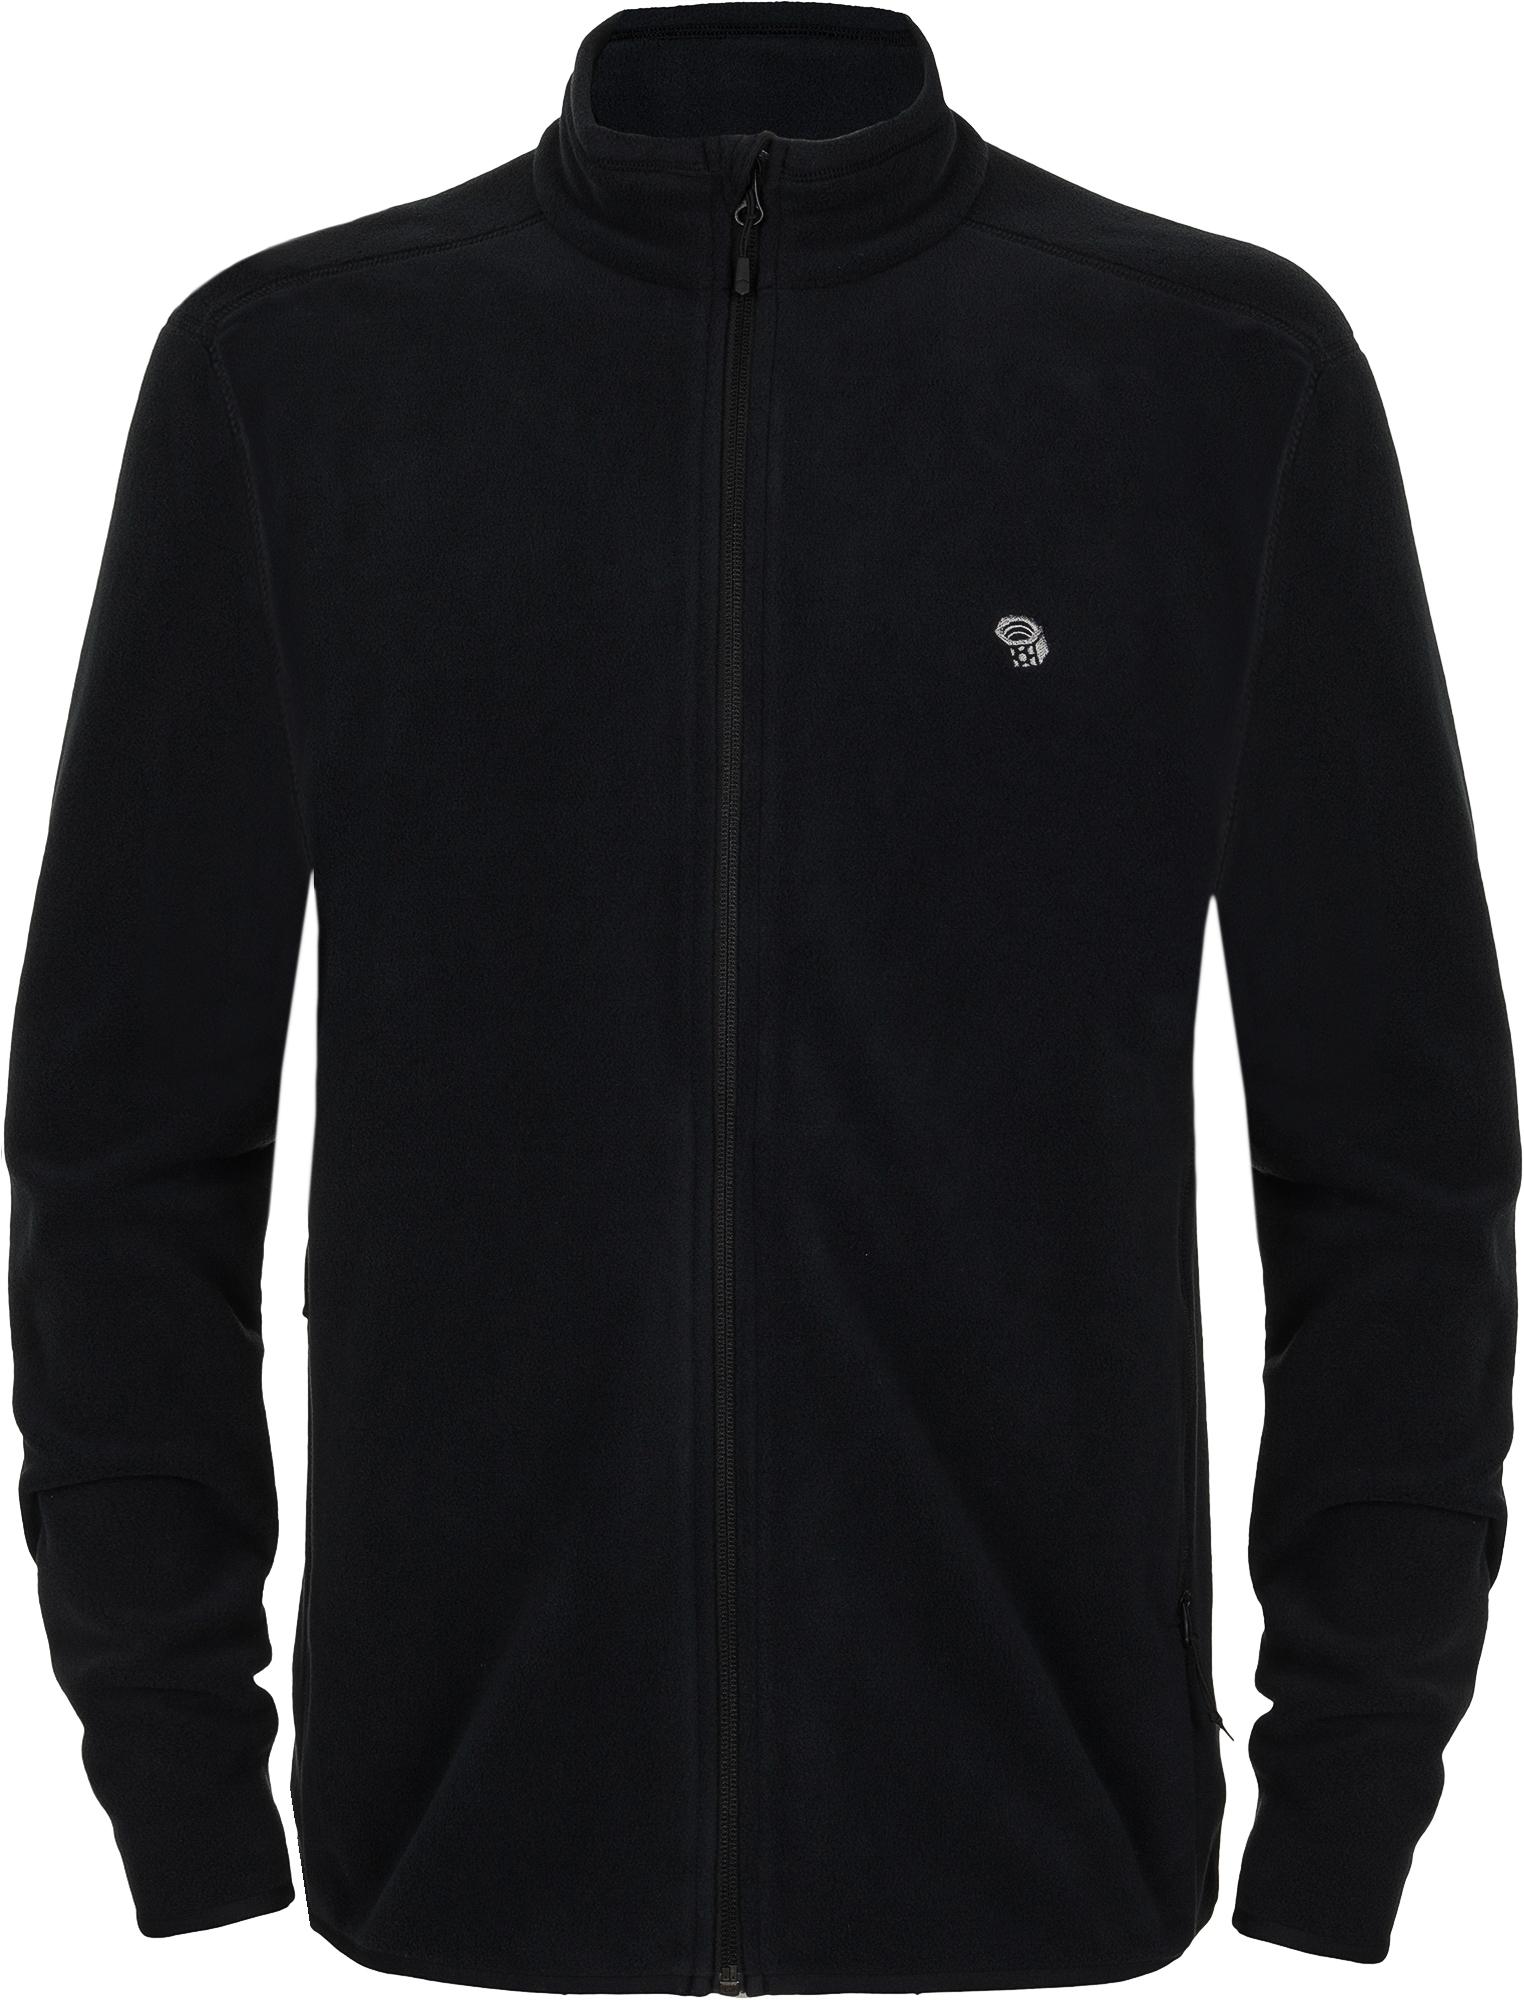 Mountain Hardwear Джемпер флисовый мужской Mountain Hardwear Macrochill™, размер 56 цена в Москве и Питере